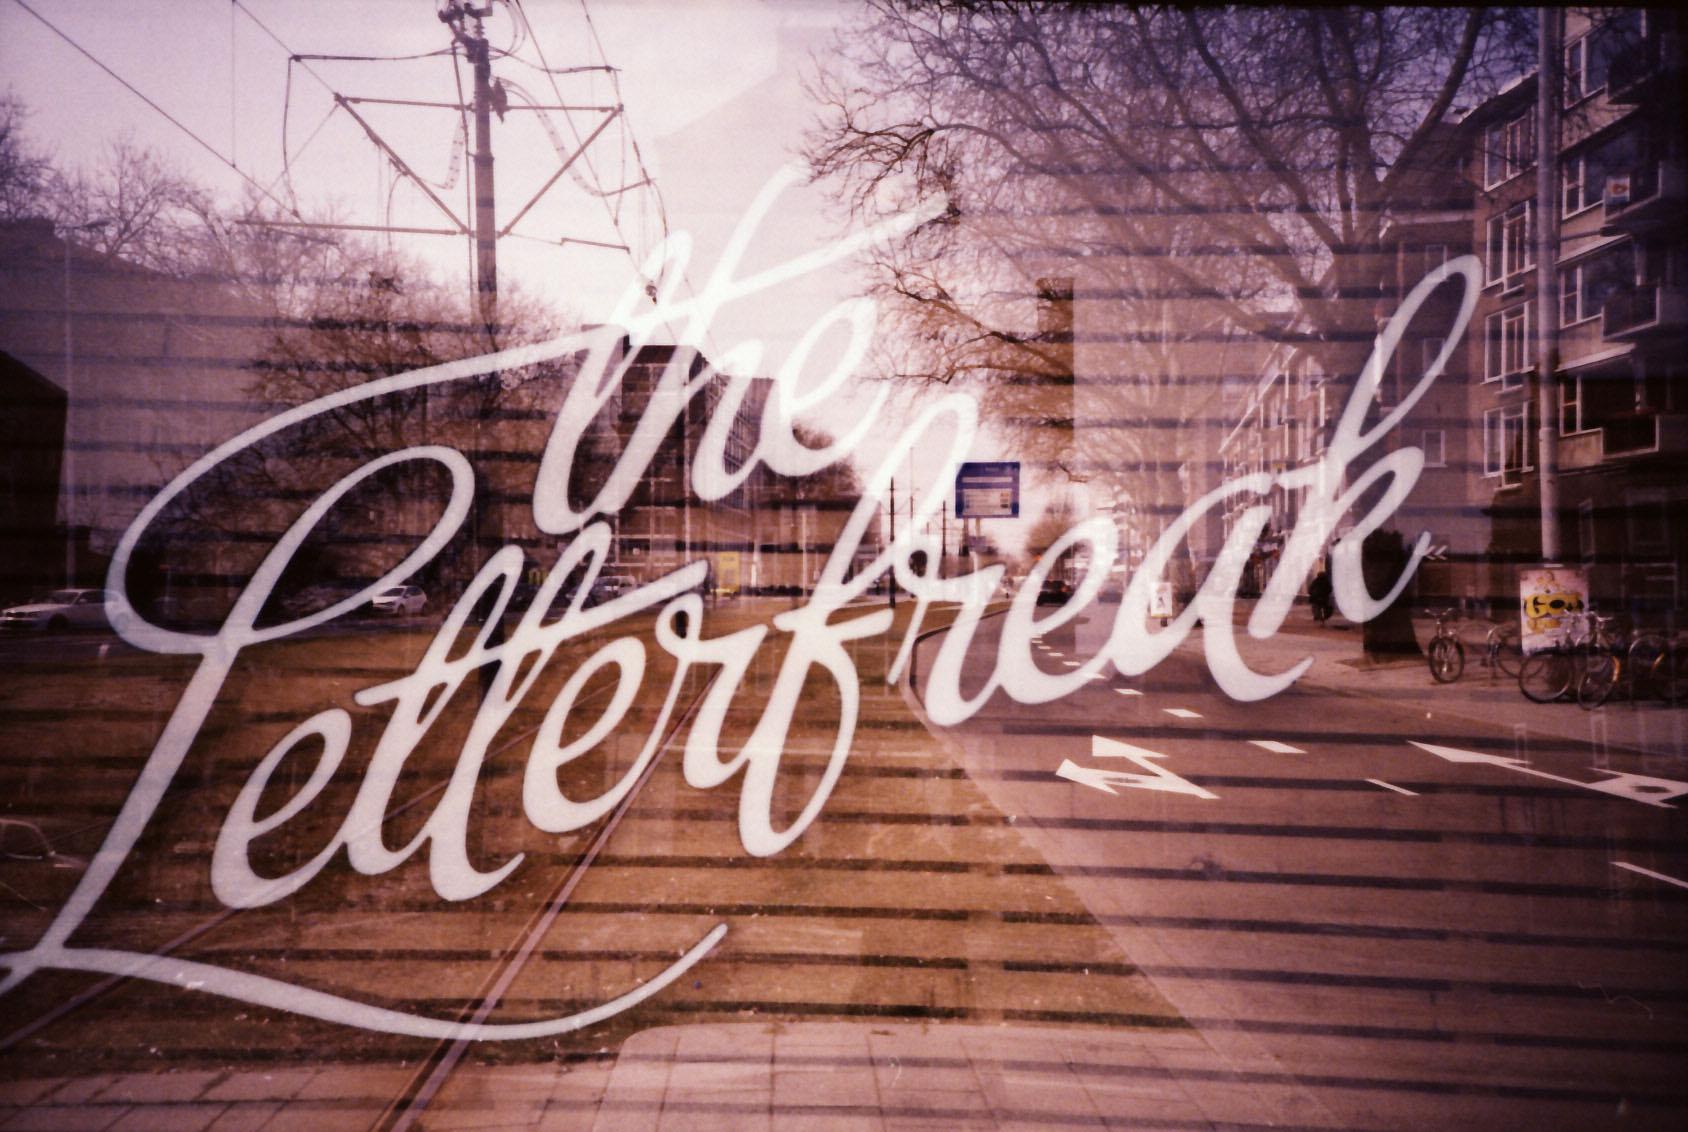 The letterfreak